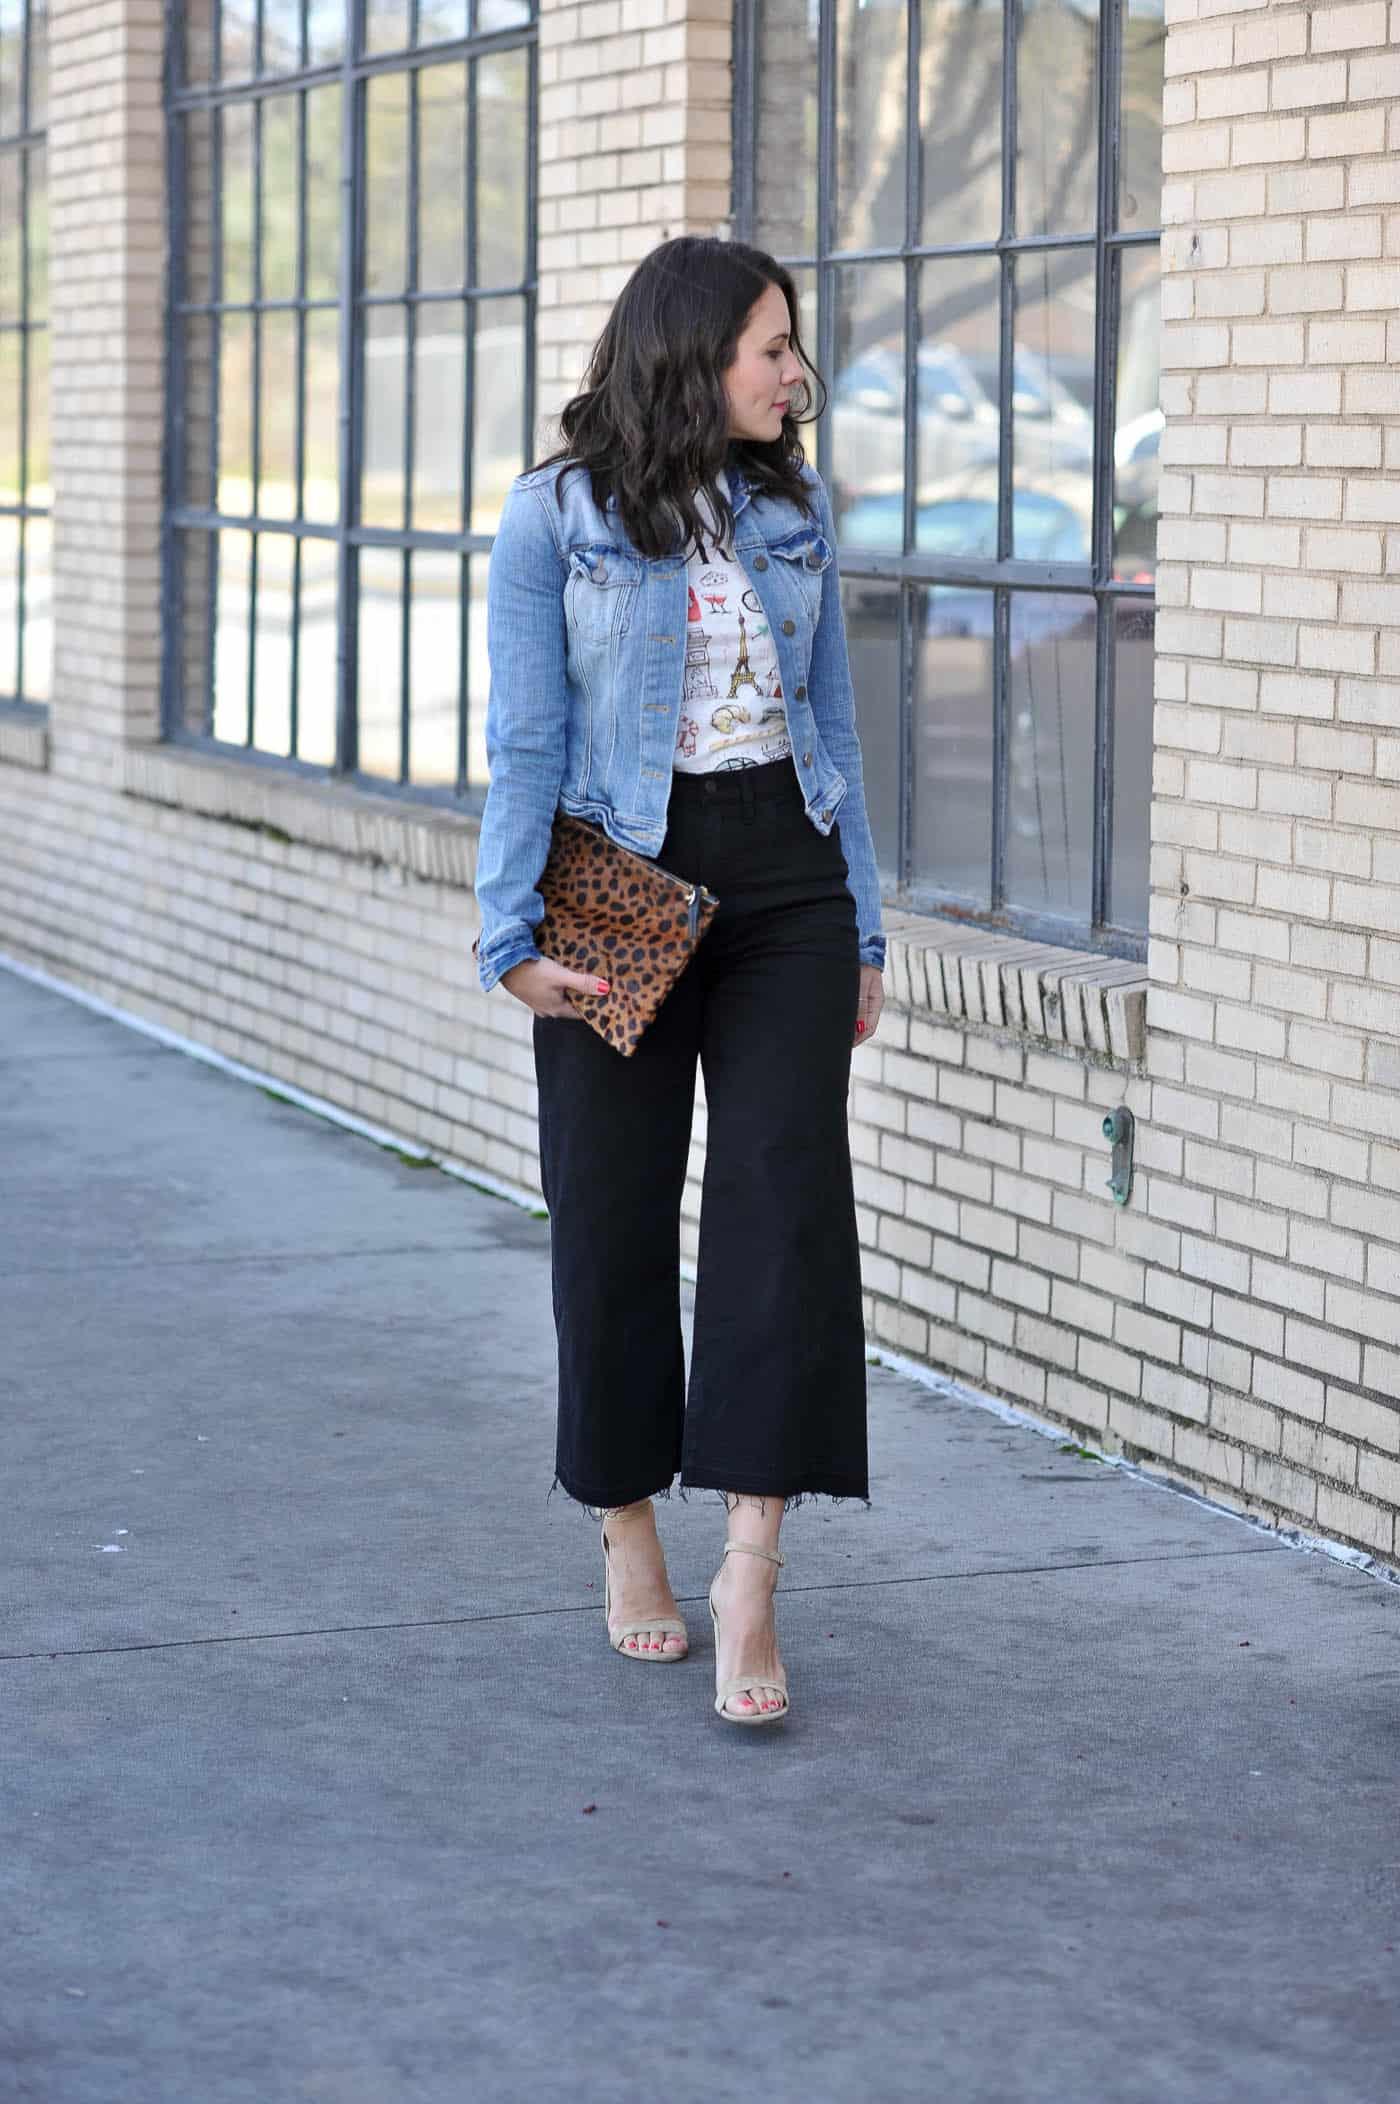 styling wide cropped jeans - My Style Vita @mystylevita